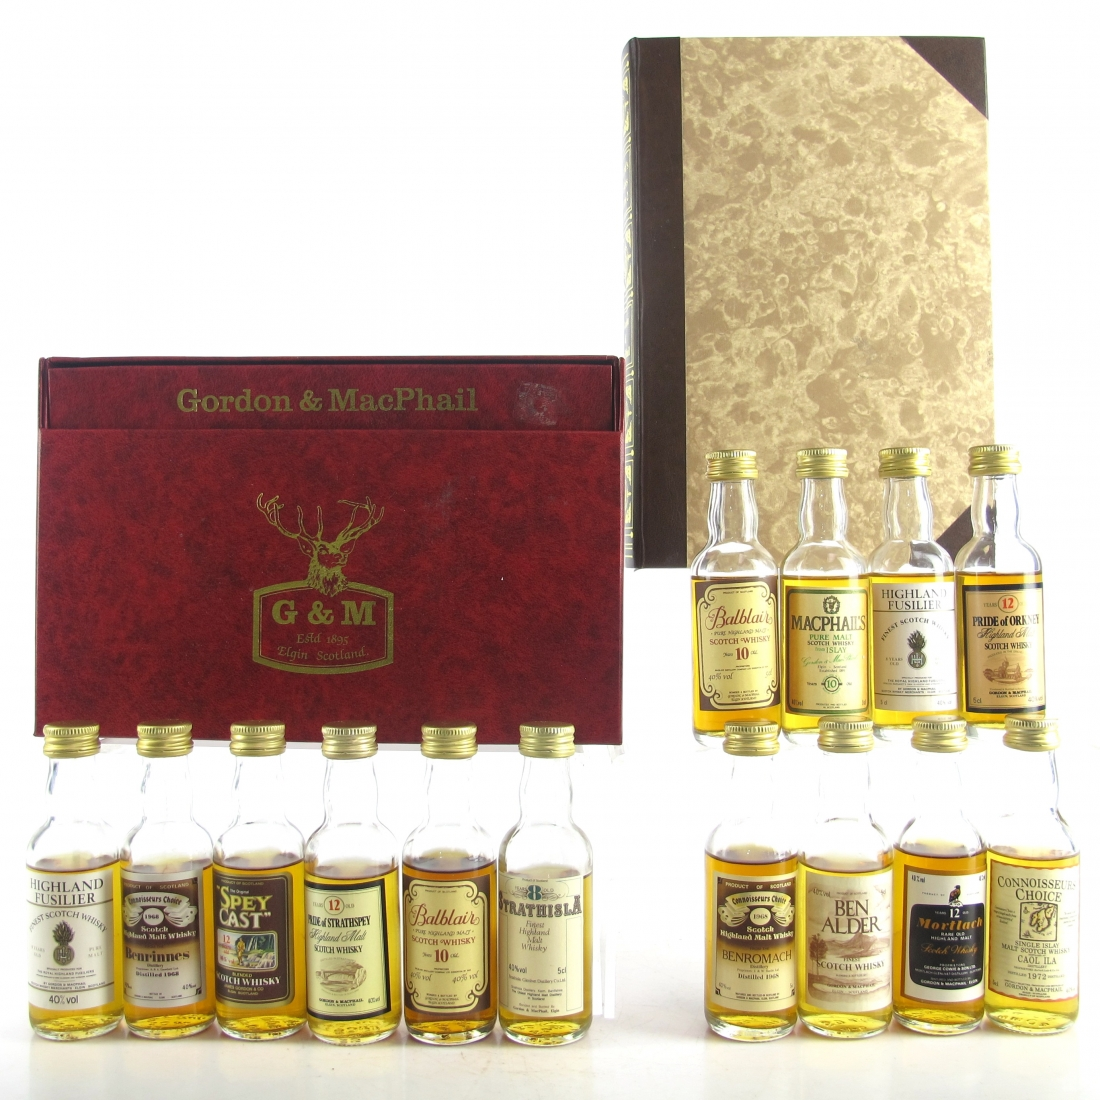 Gordon and MacPhail Miniature Gift Sets x 2 / 14 x 5cl